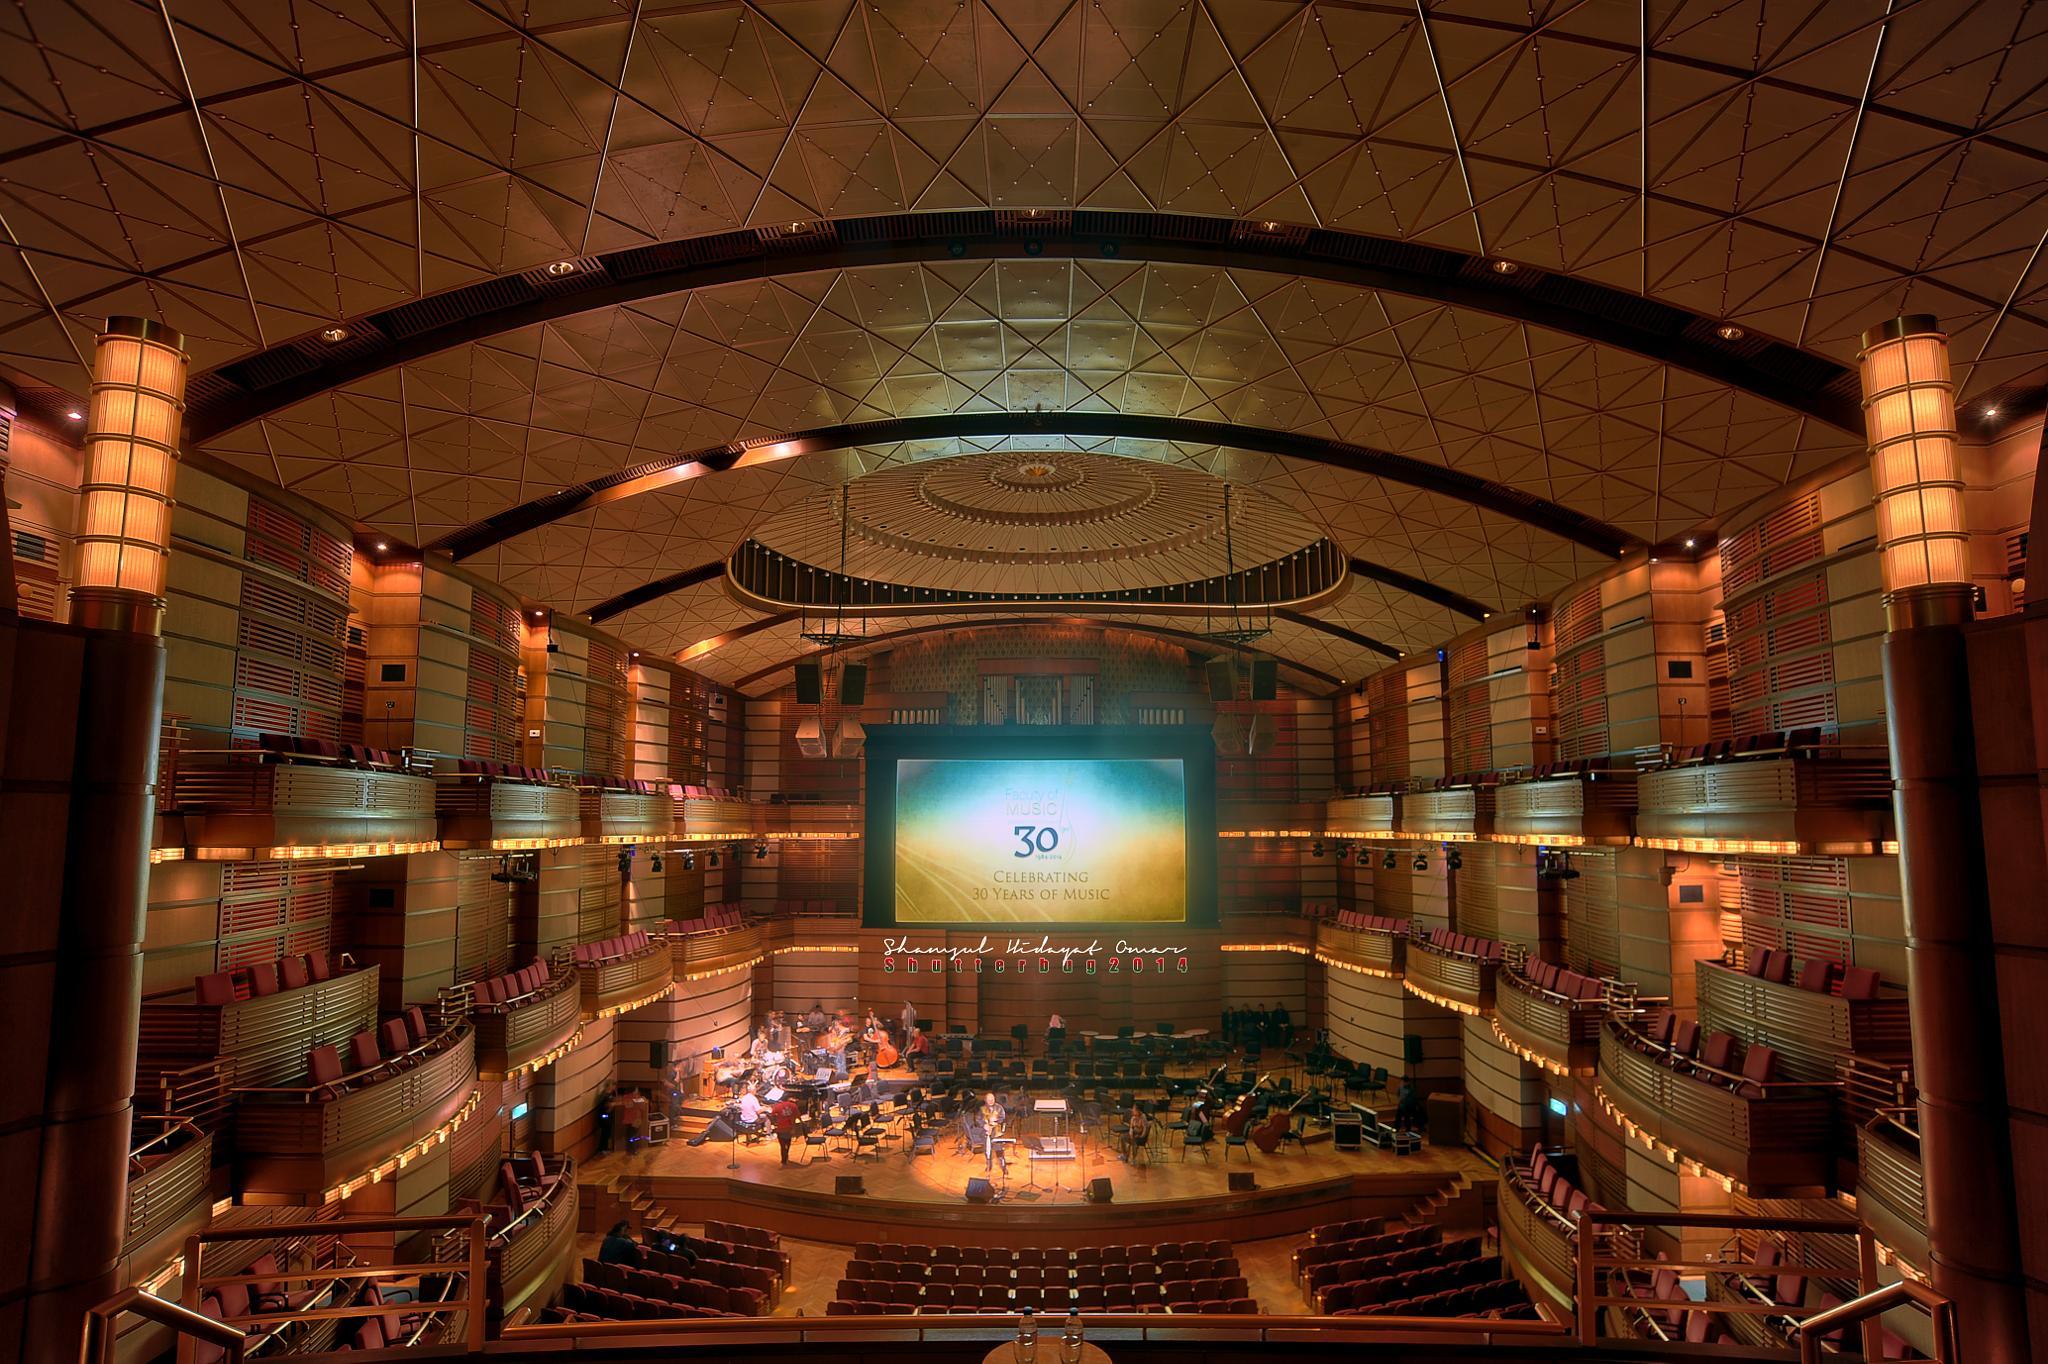 Malaysian Philharmonic Orchestra | Scene 1 by ShamsulHidayatOmar